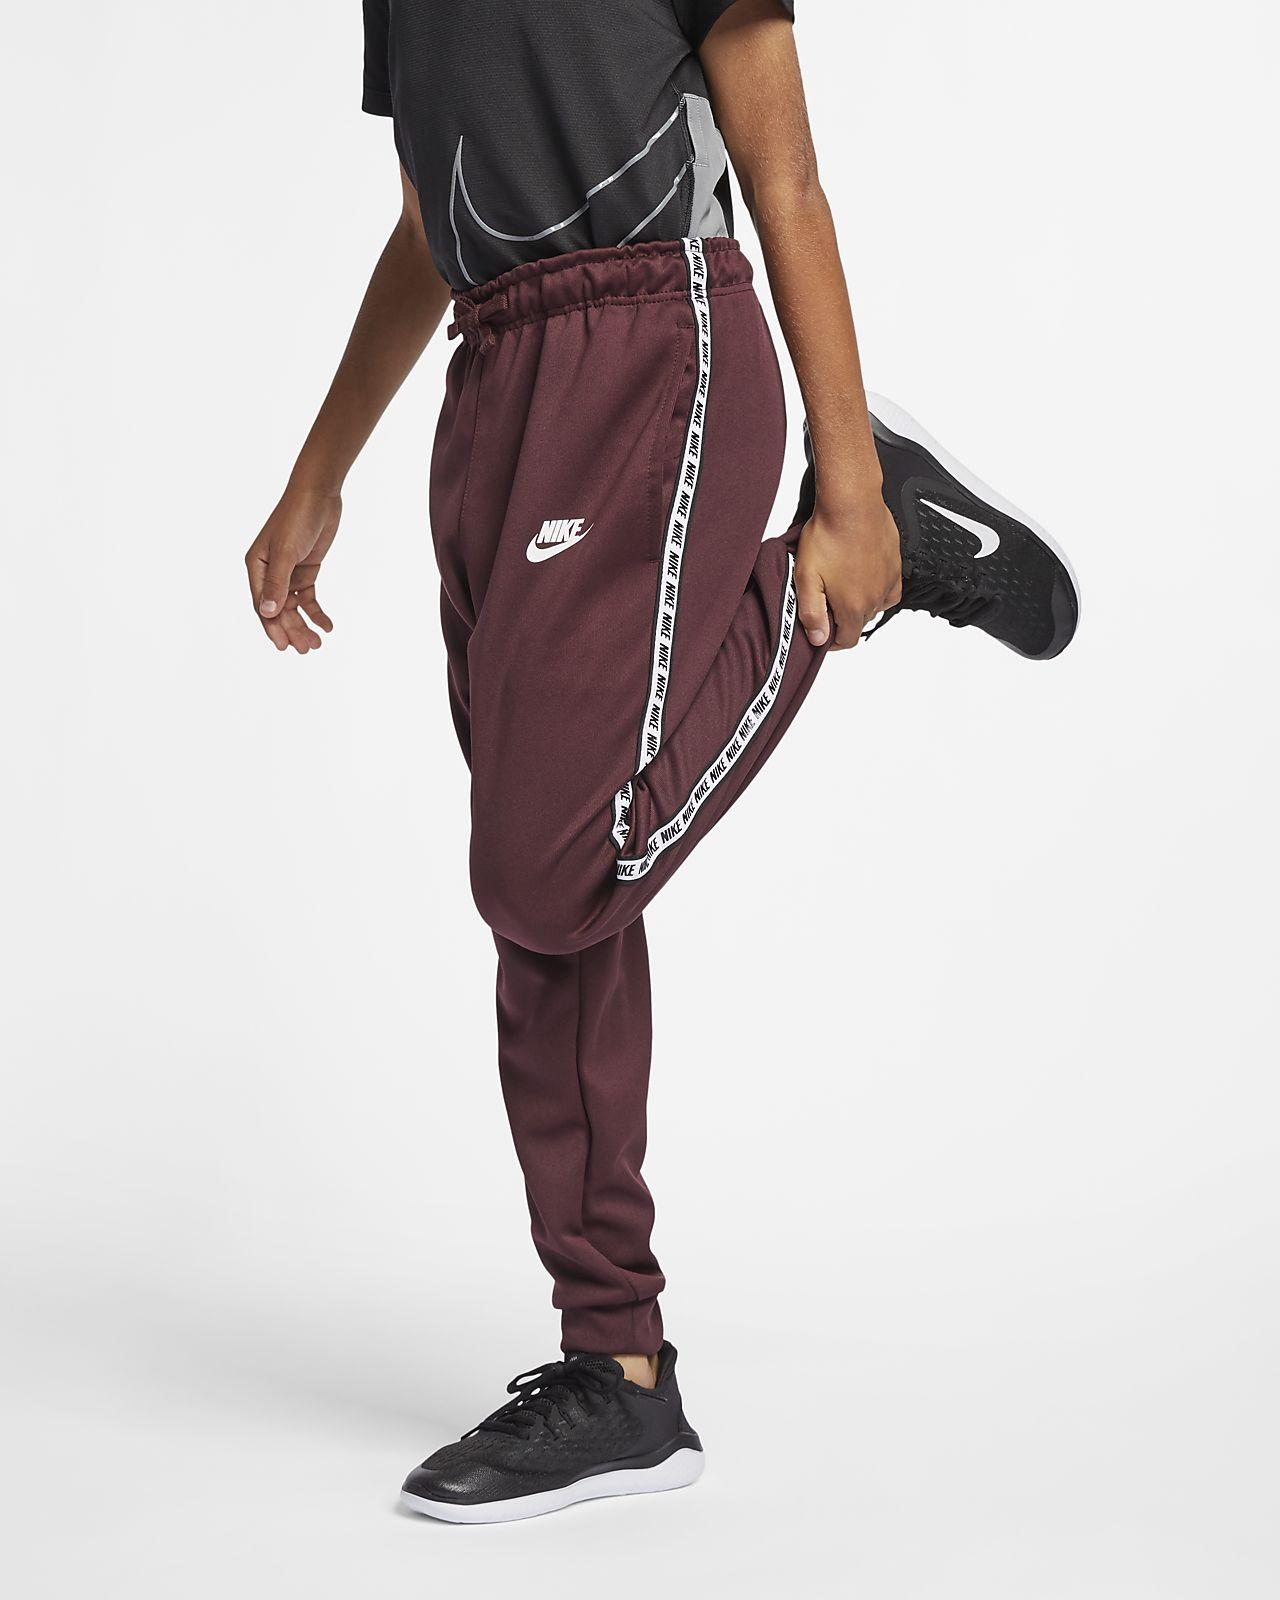 Pantaloni Nike Sportswear - Ragazzi